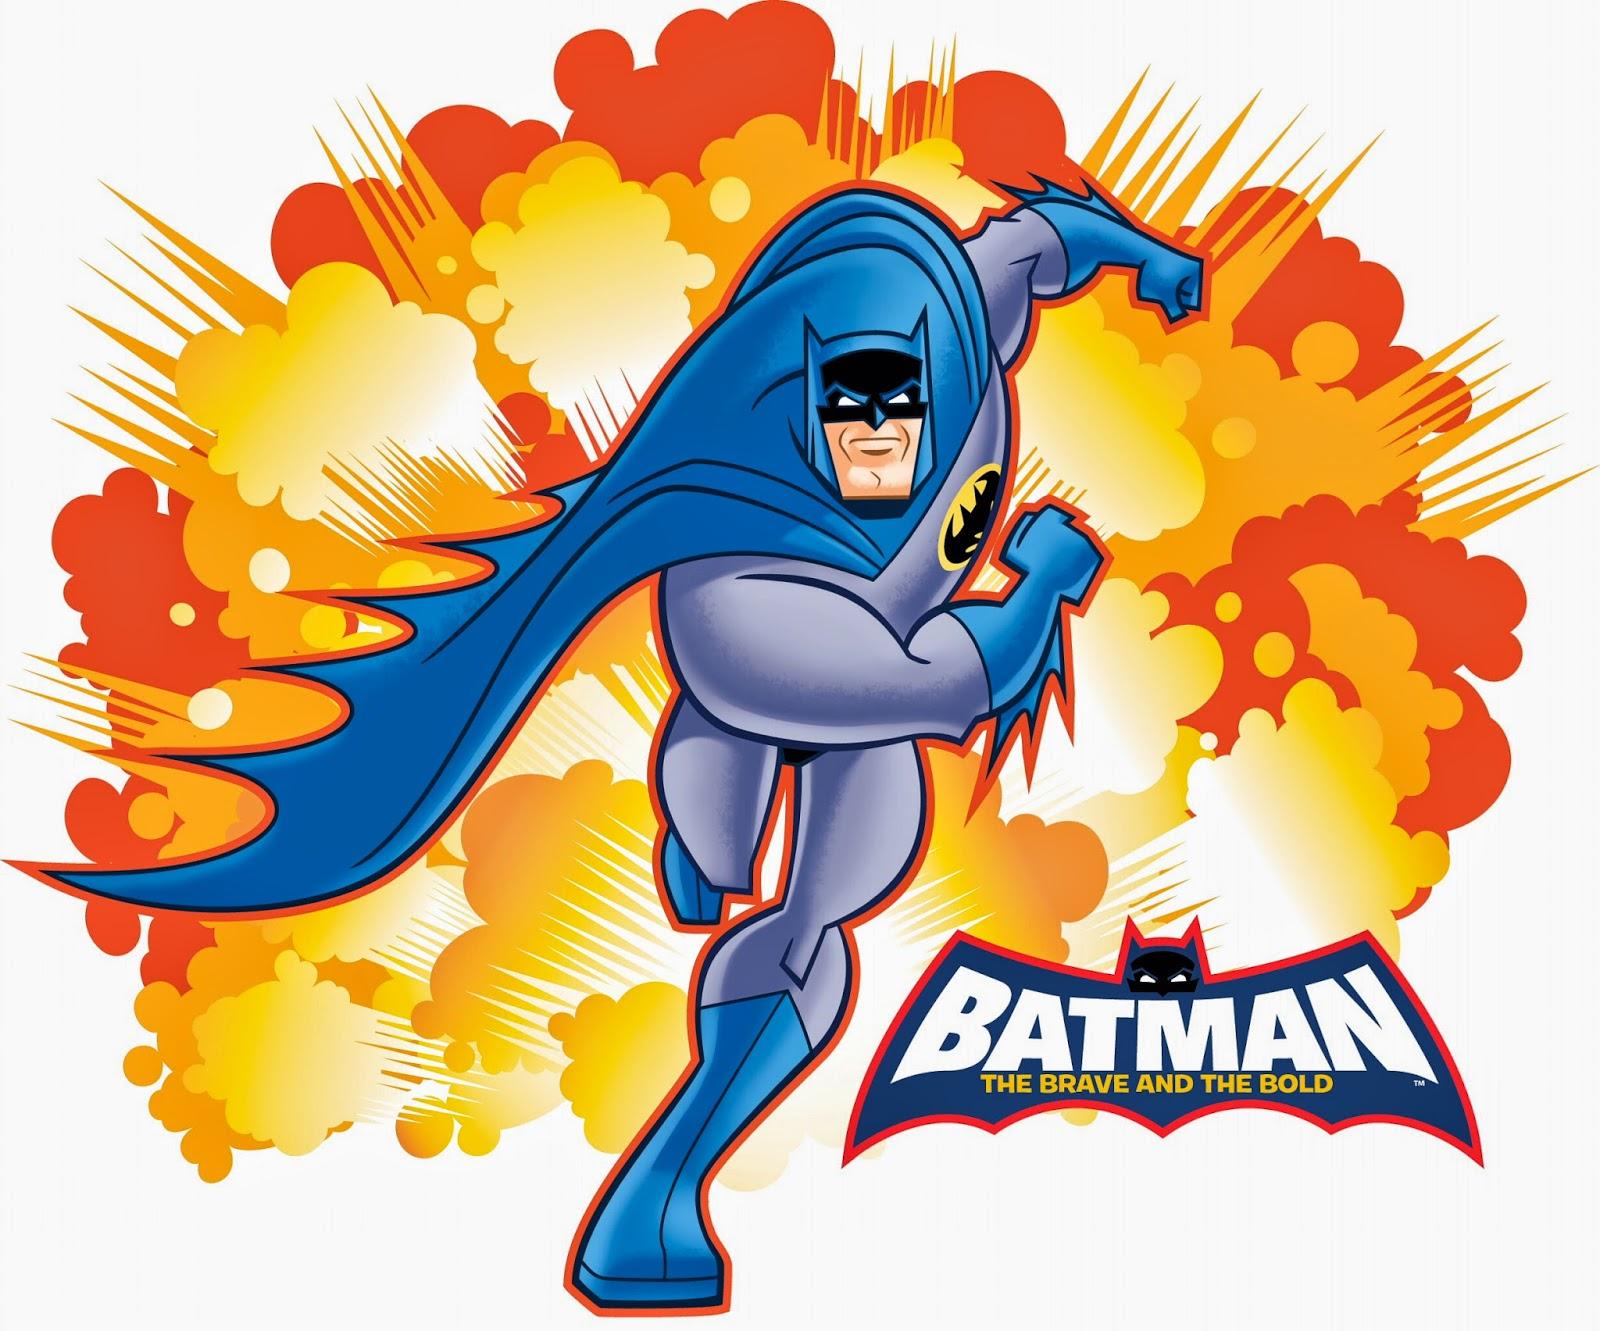 Kumpulan Gambar Batman The Brave and the Bold | Gambar